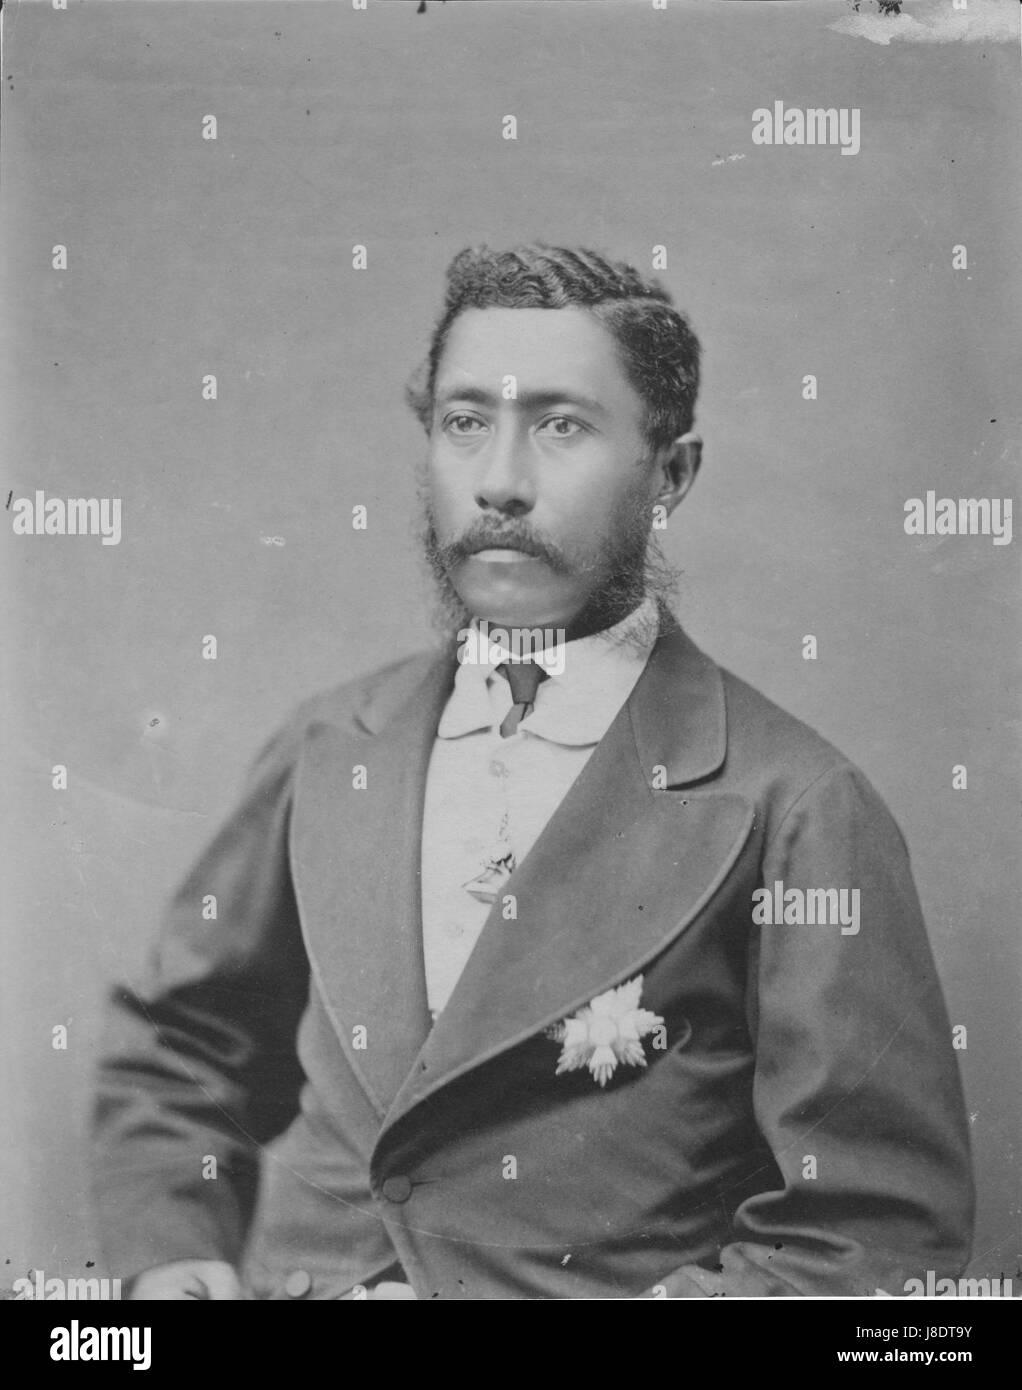 1873-1874 Photo Lunalilo King of Hawaii